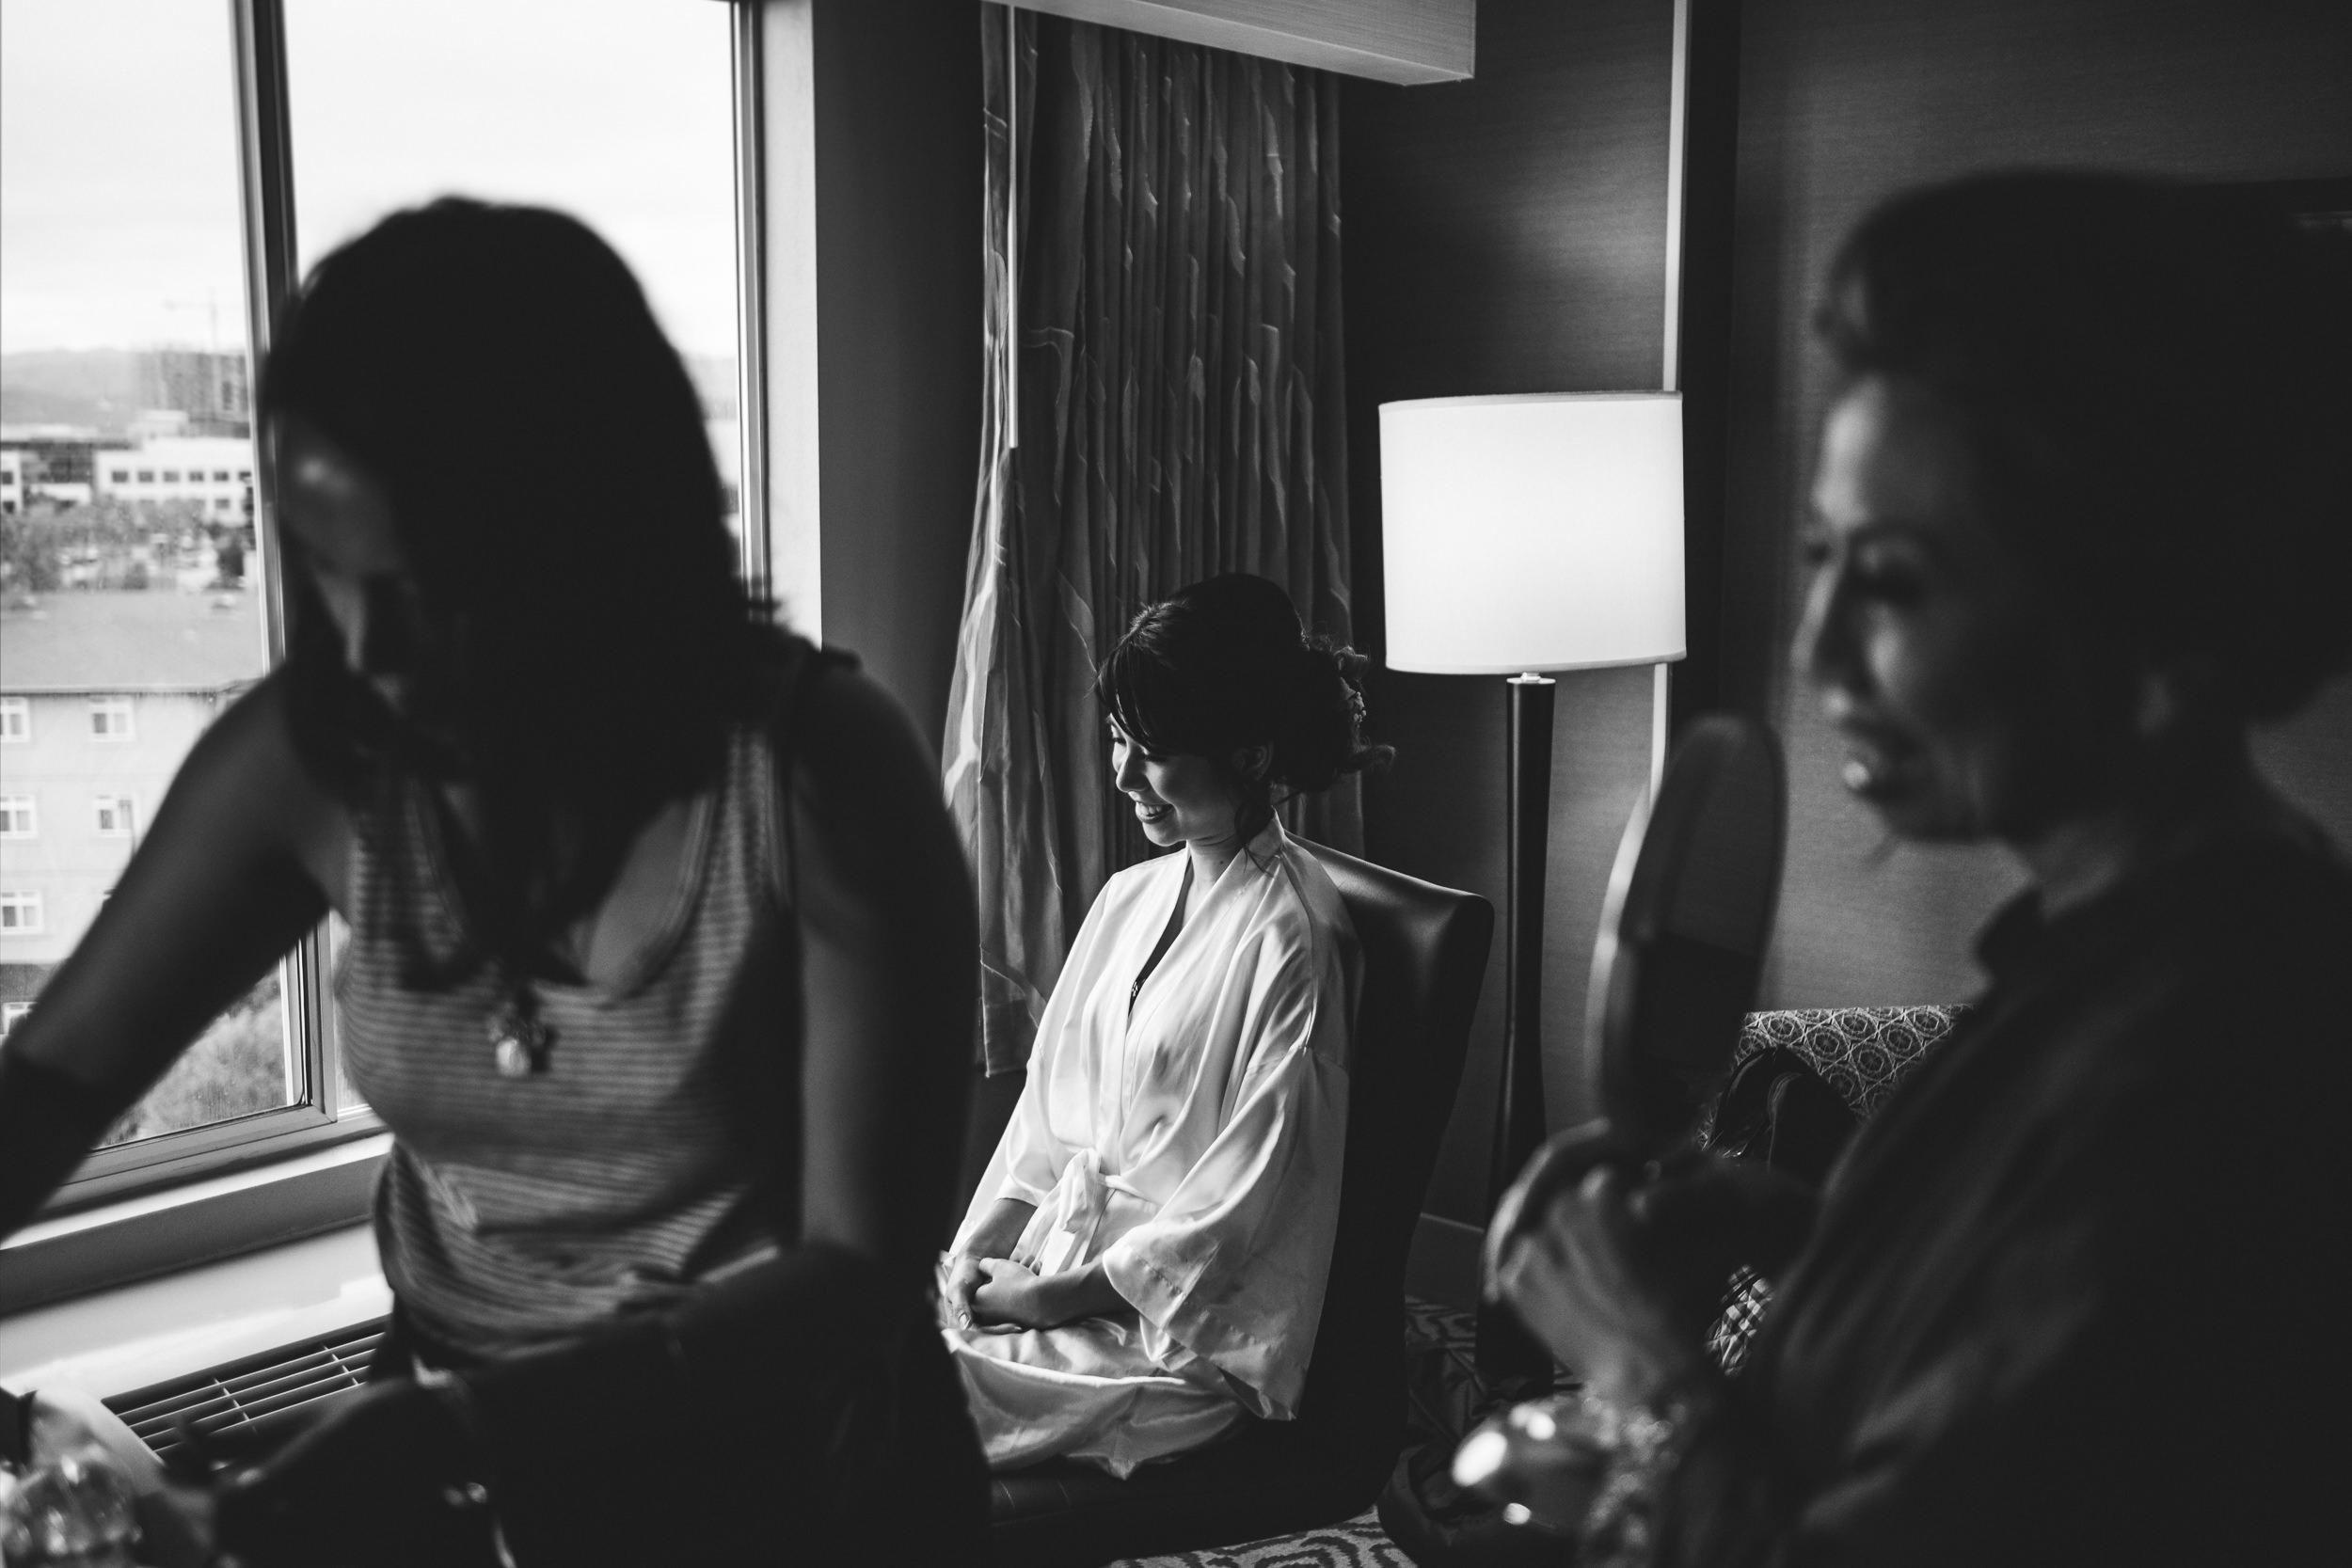 San-Francisco-City-Hall-Wedding-Photography-007.jpg